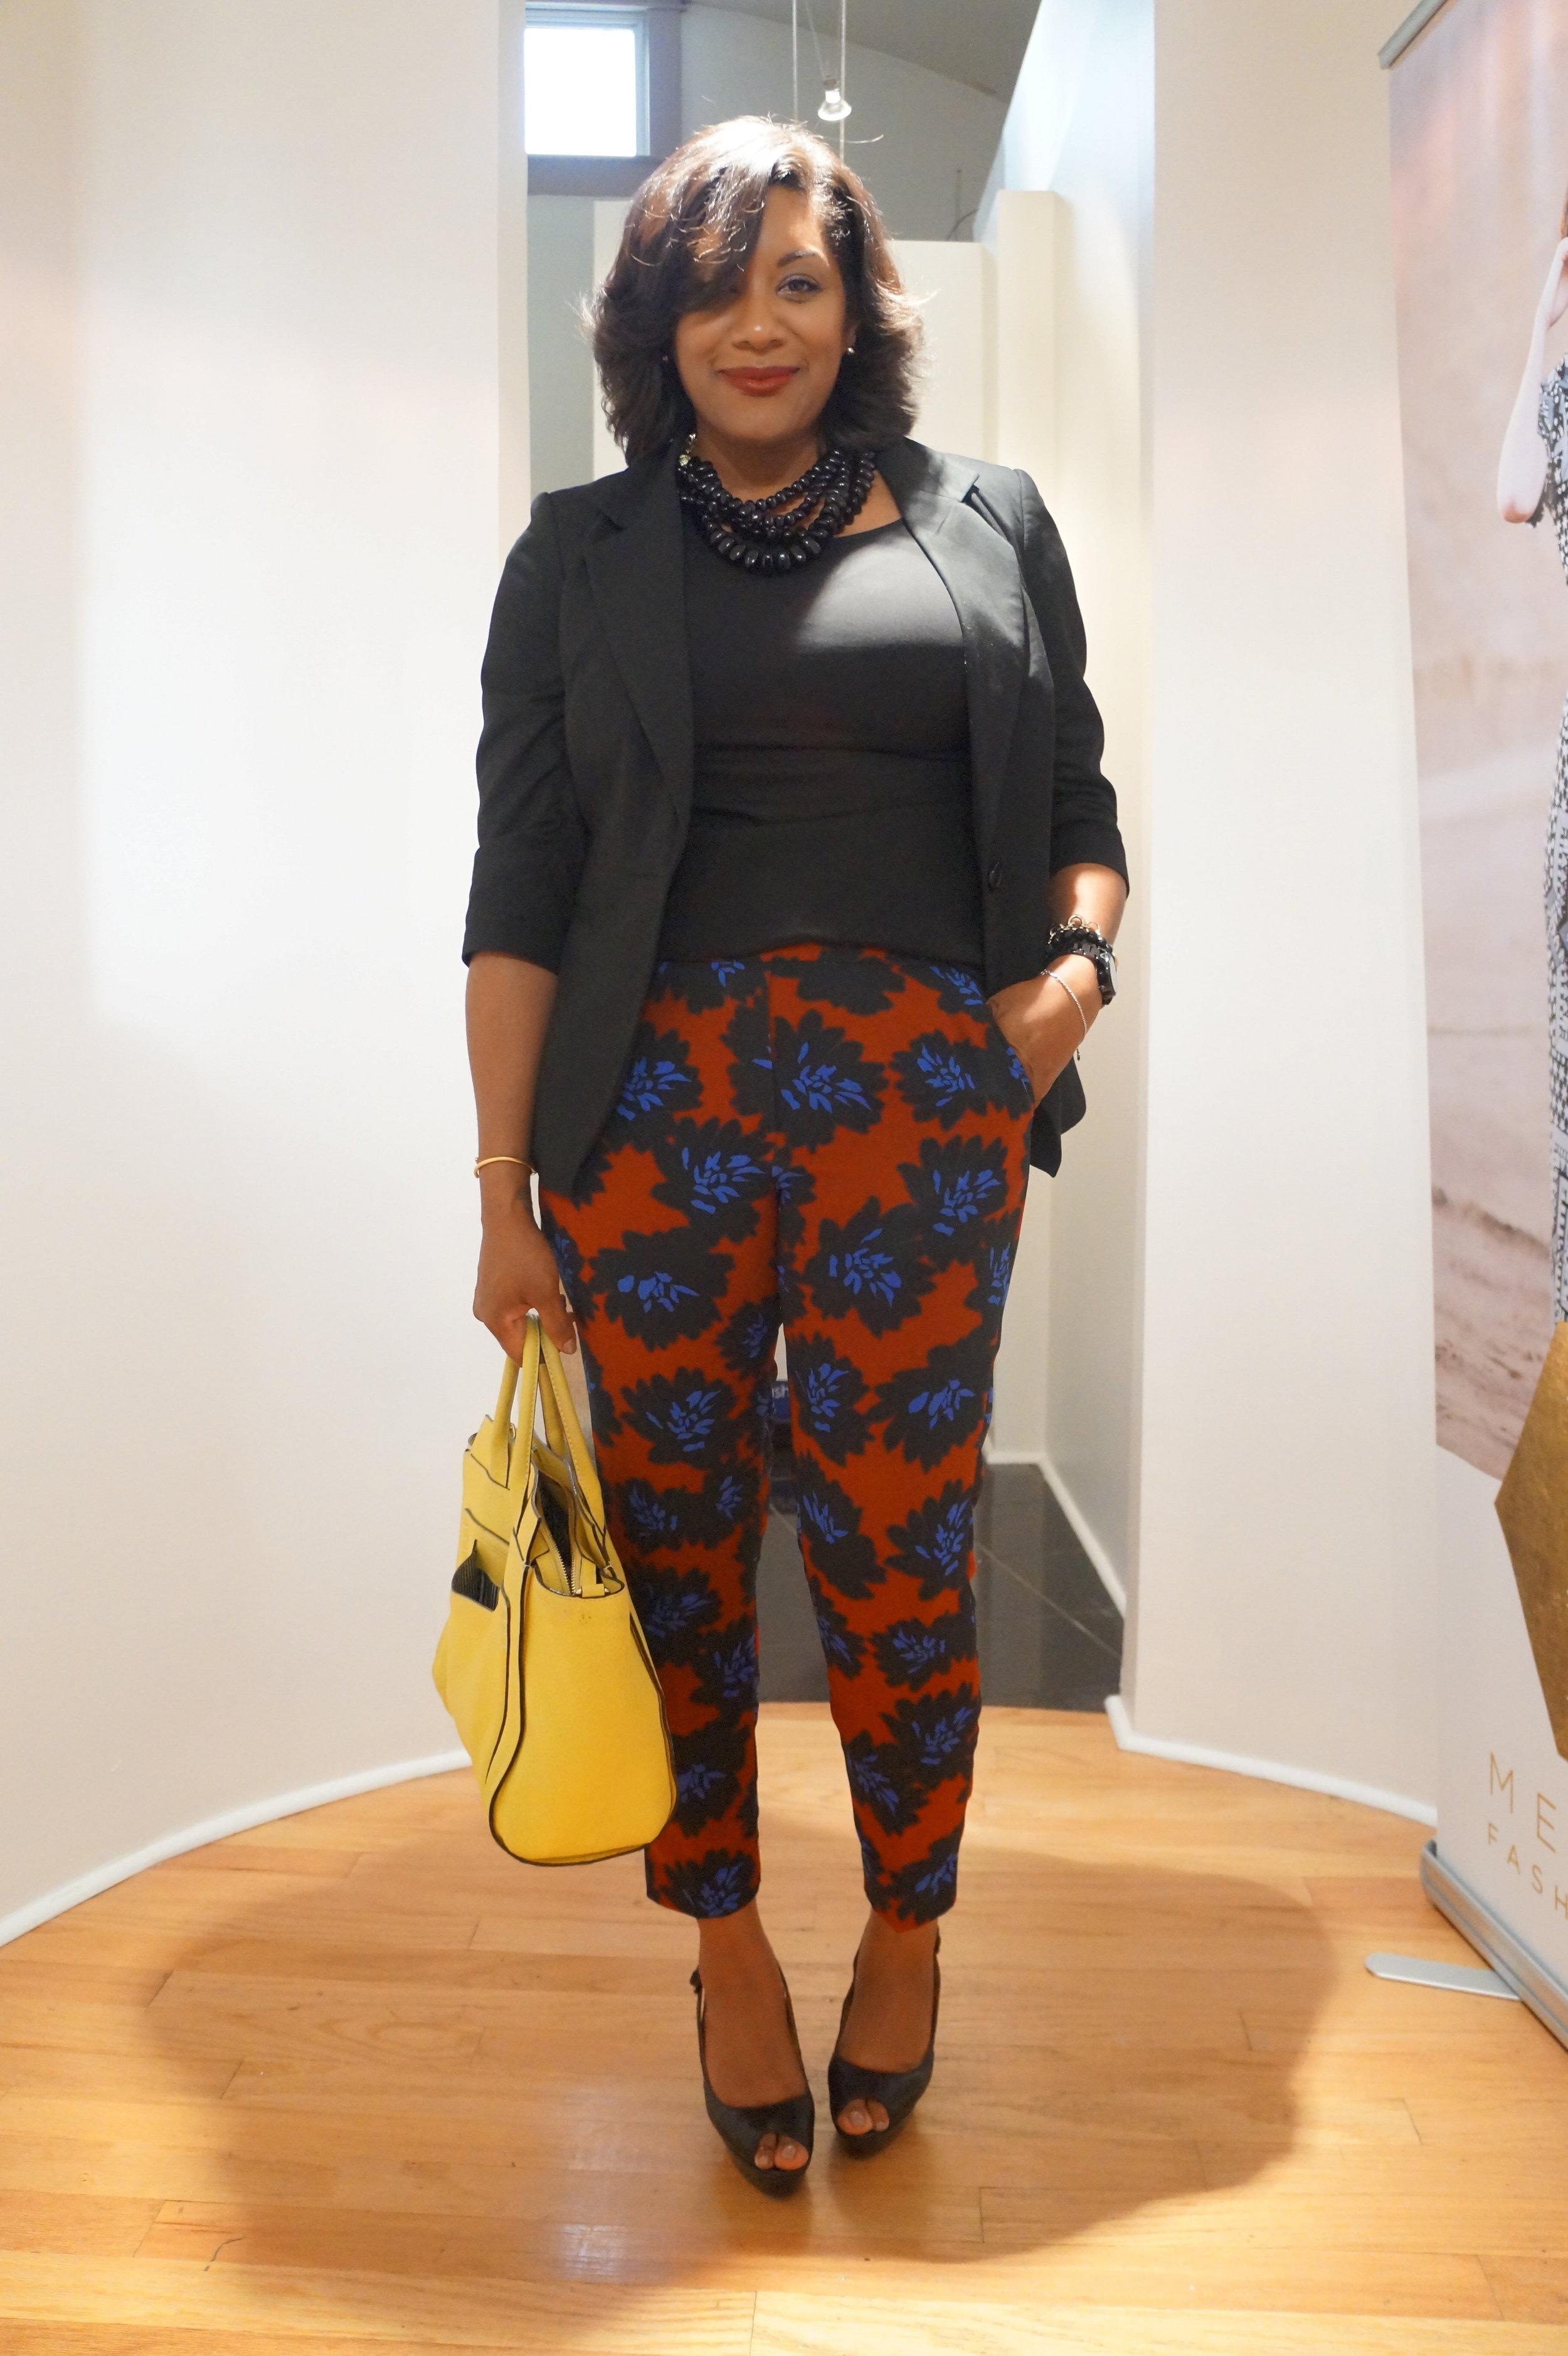 Blogger Quaneshia of According to Q